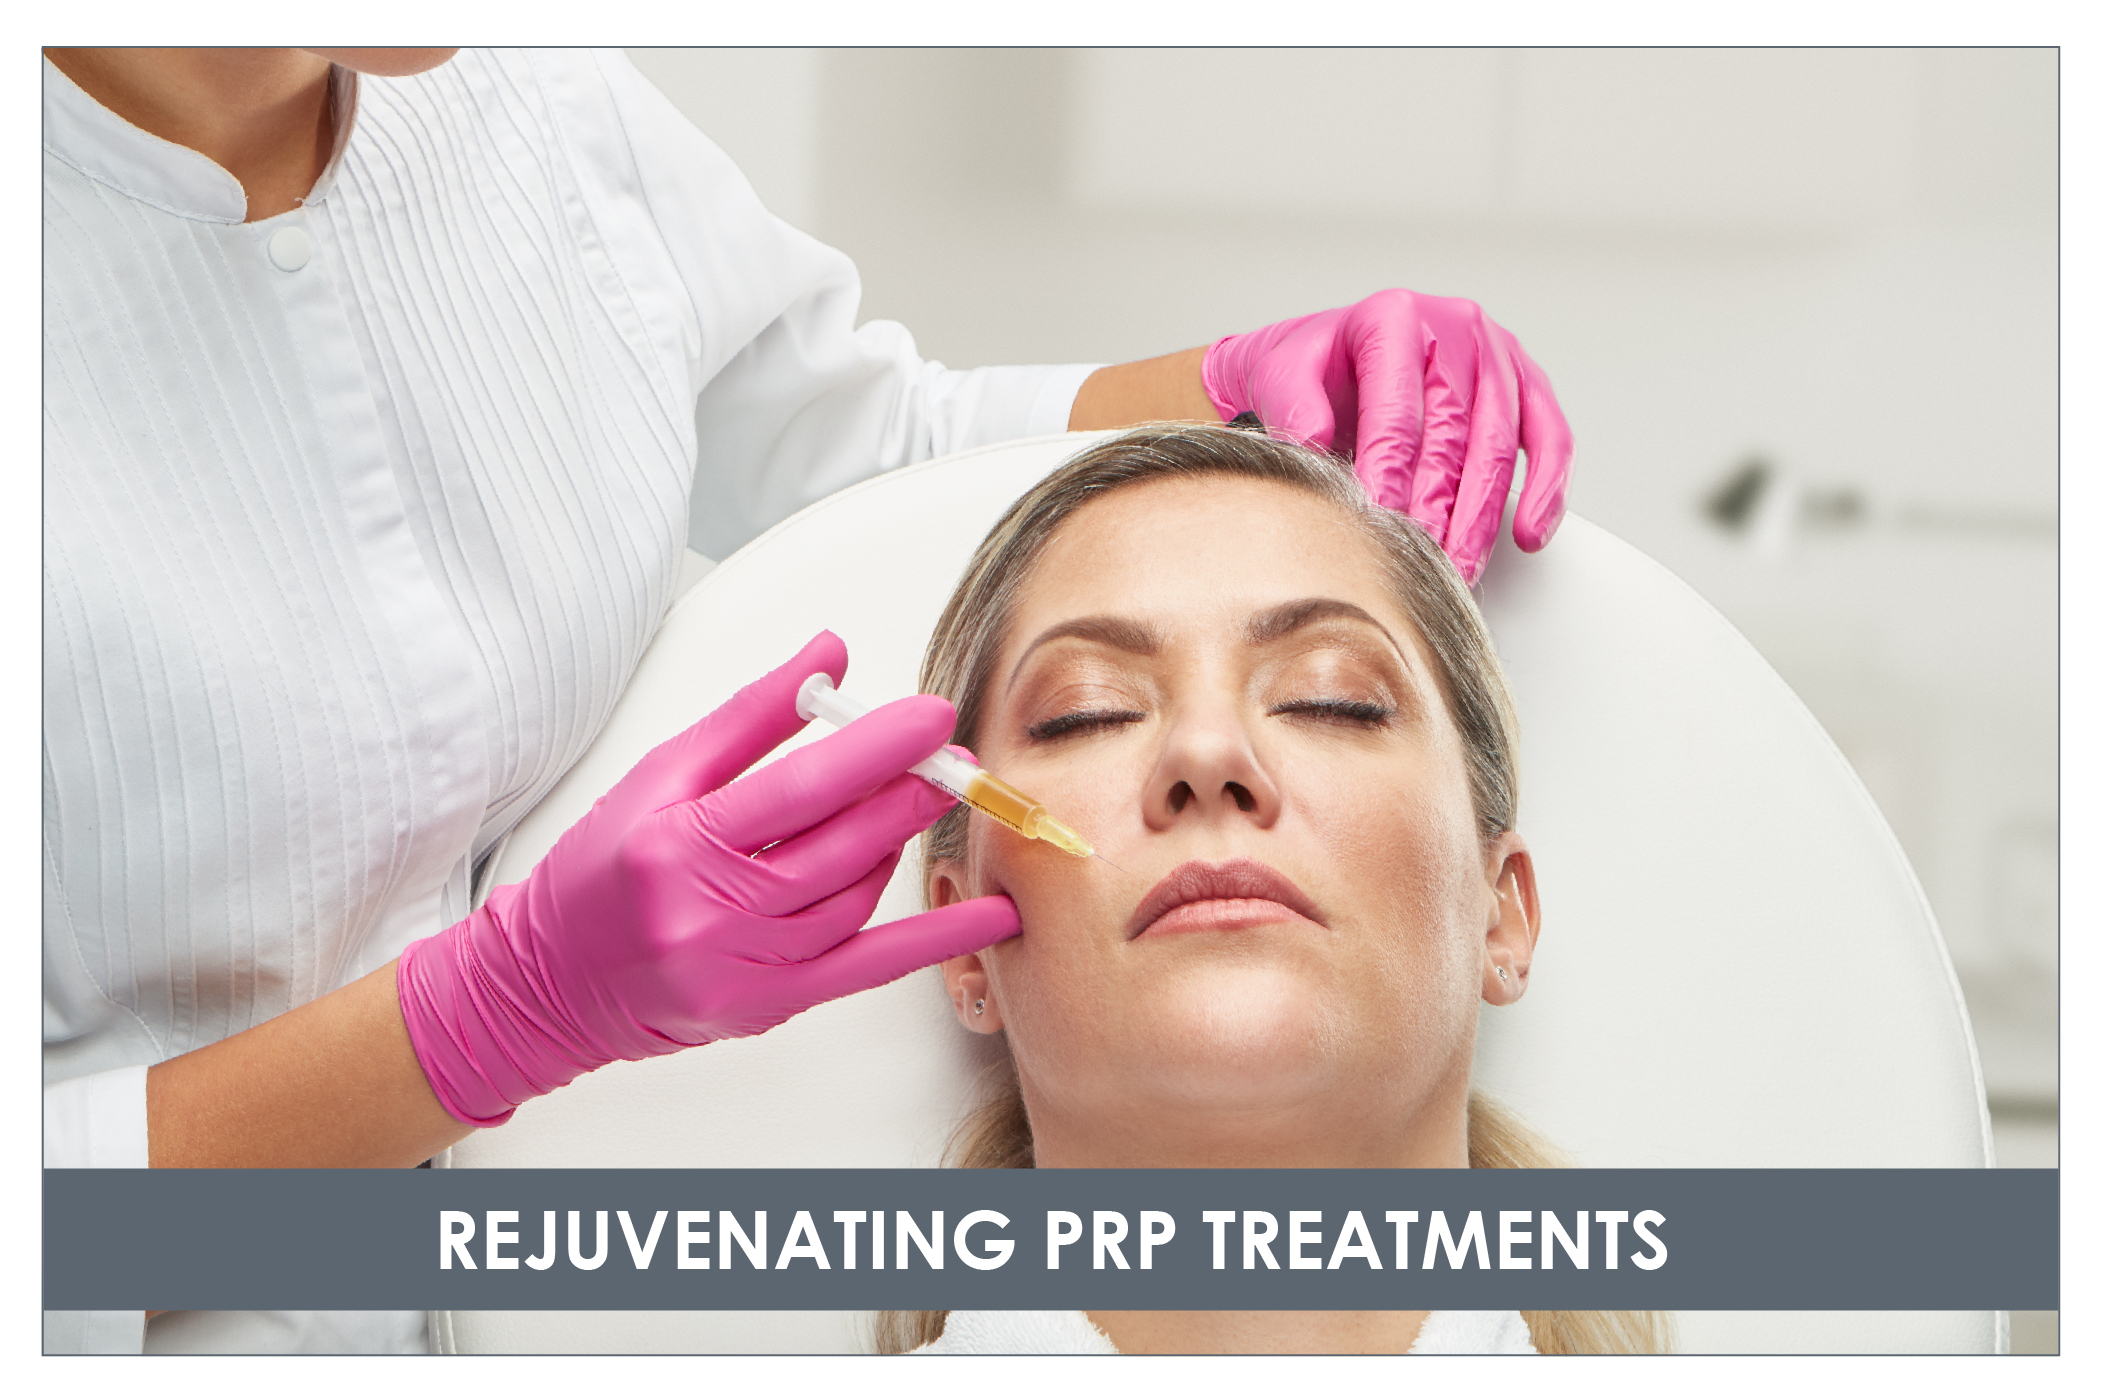 PRP Vampire facial treatments